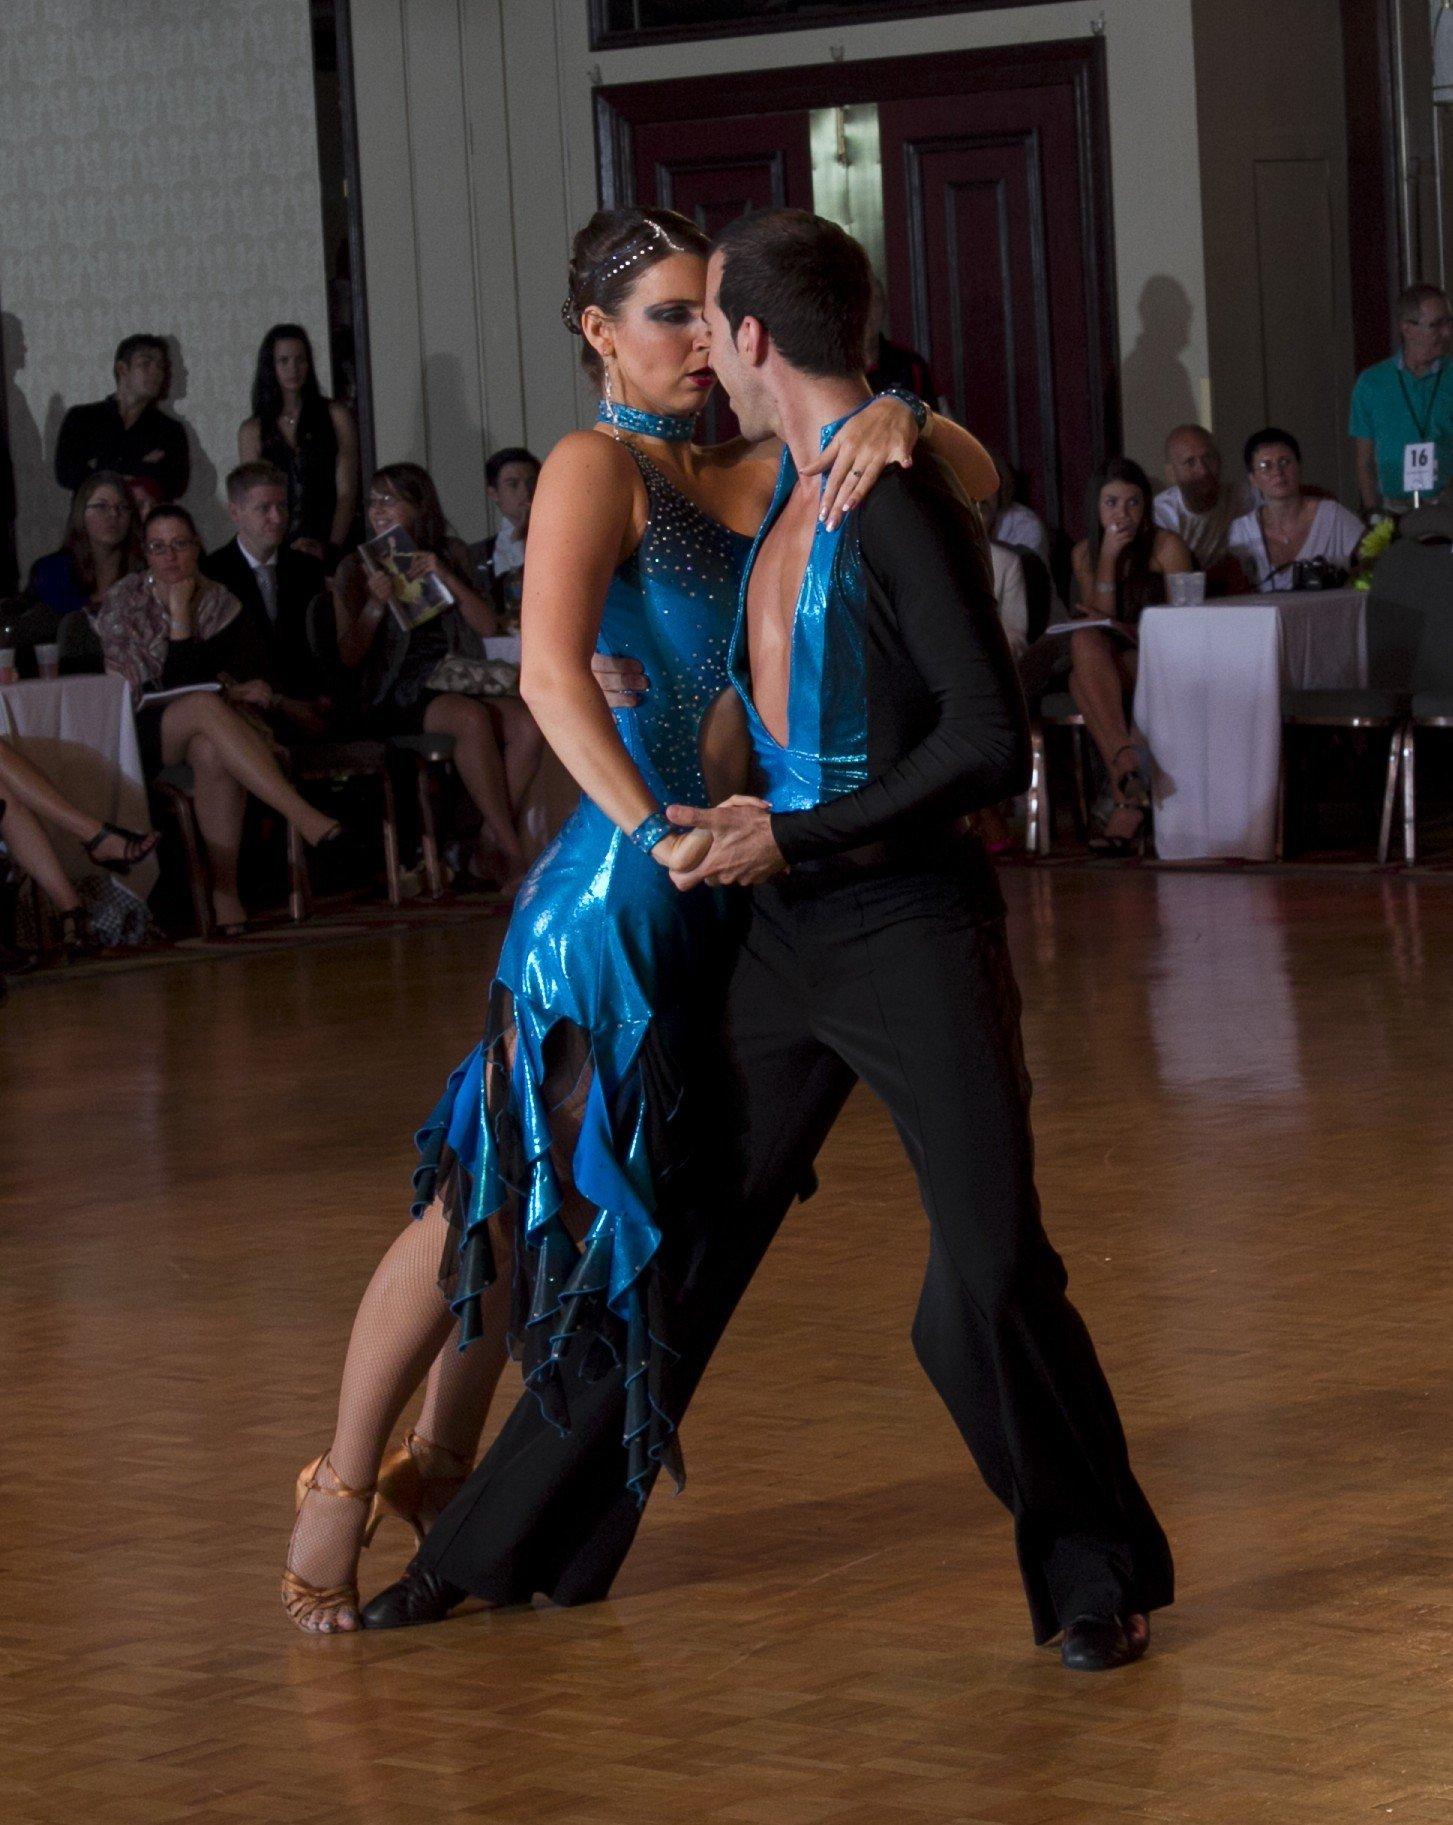 DanseSport 2012: Professionnel Open Rrhythm